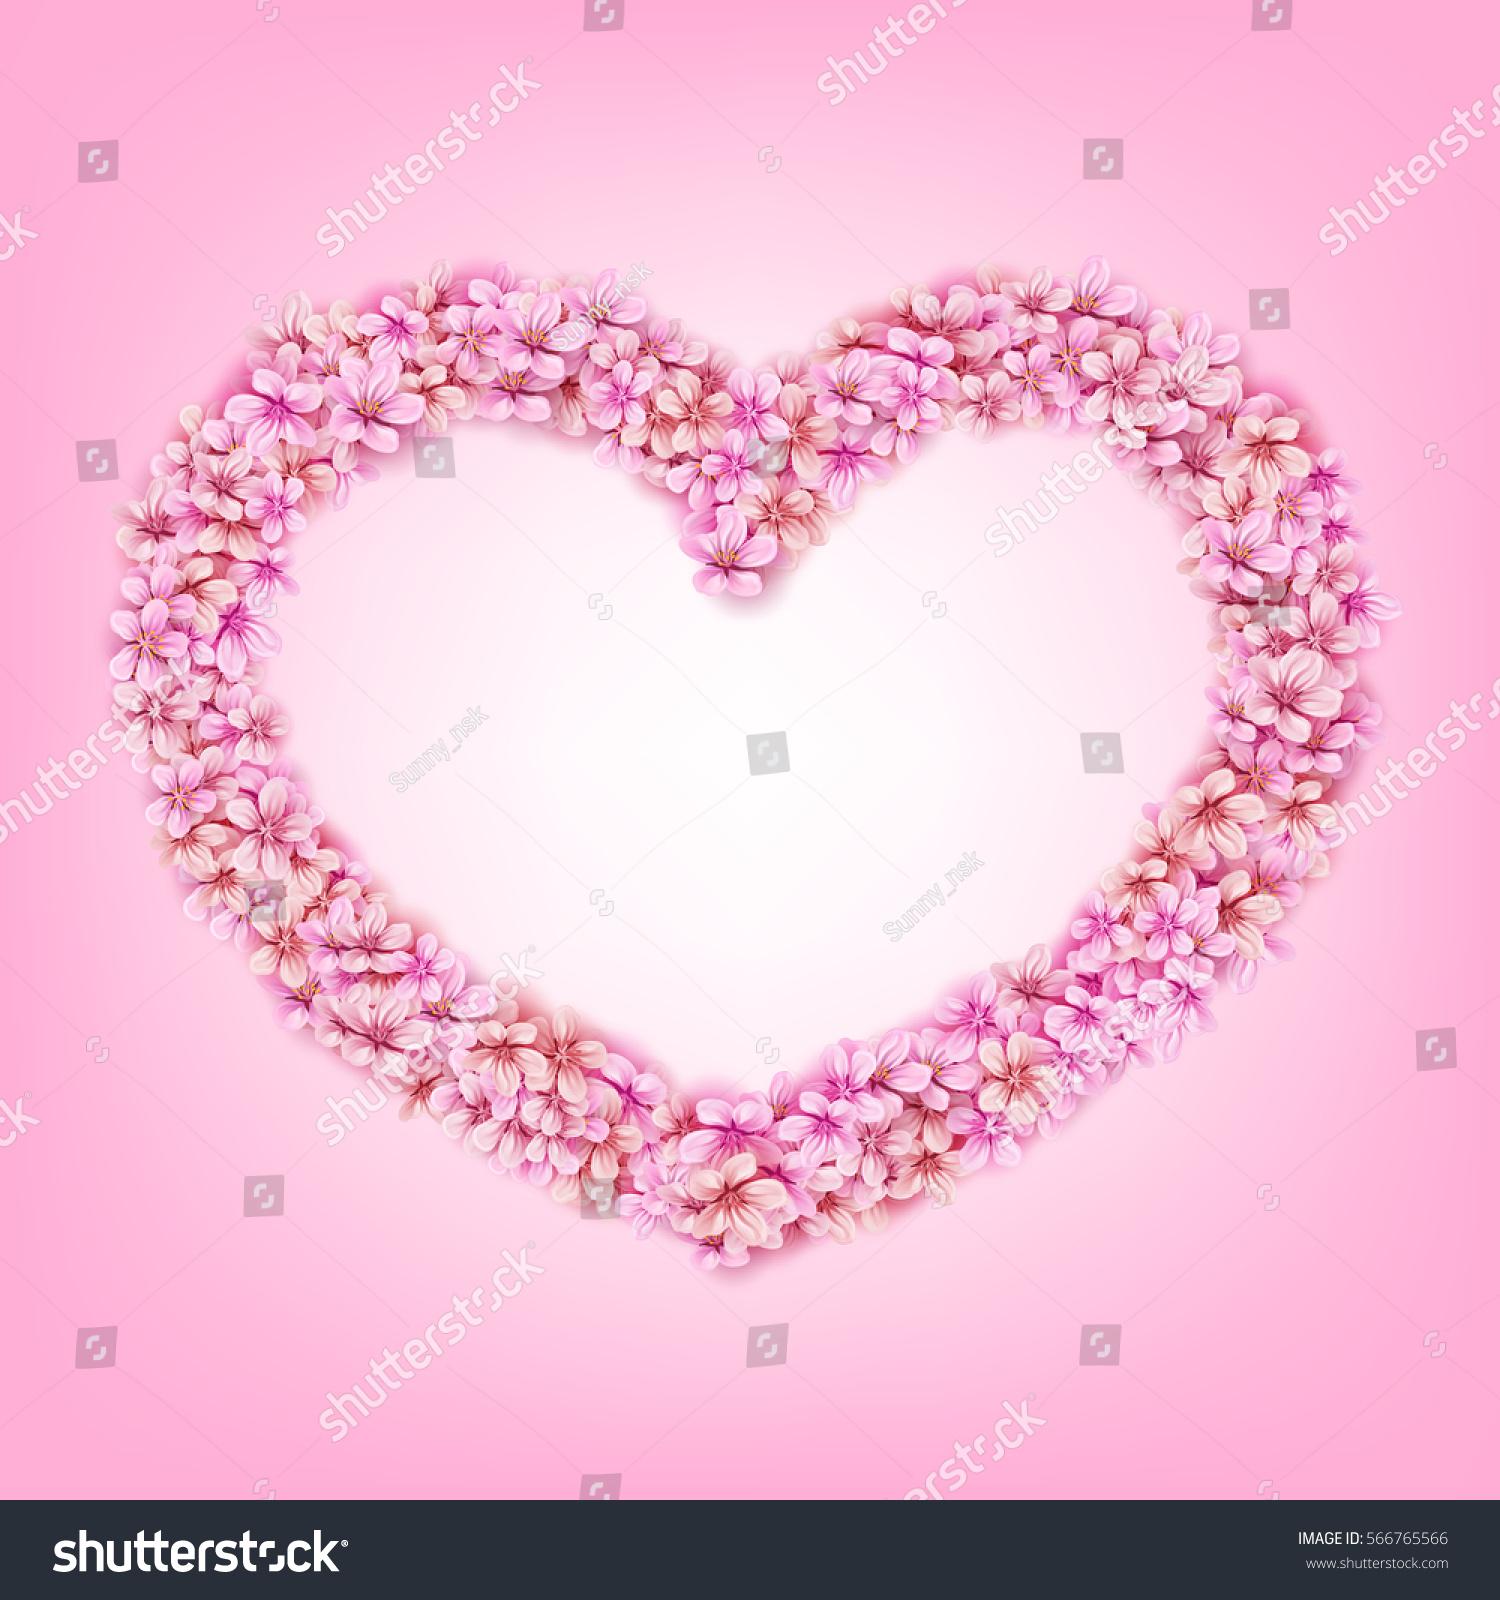 Vector pink sakura flowers japan cherry stock vector 566765566 vector pink sakura flowers japan cherry floral frame heart shape for valentines day decorative romantic element dhlflorist Images